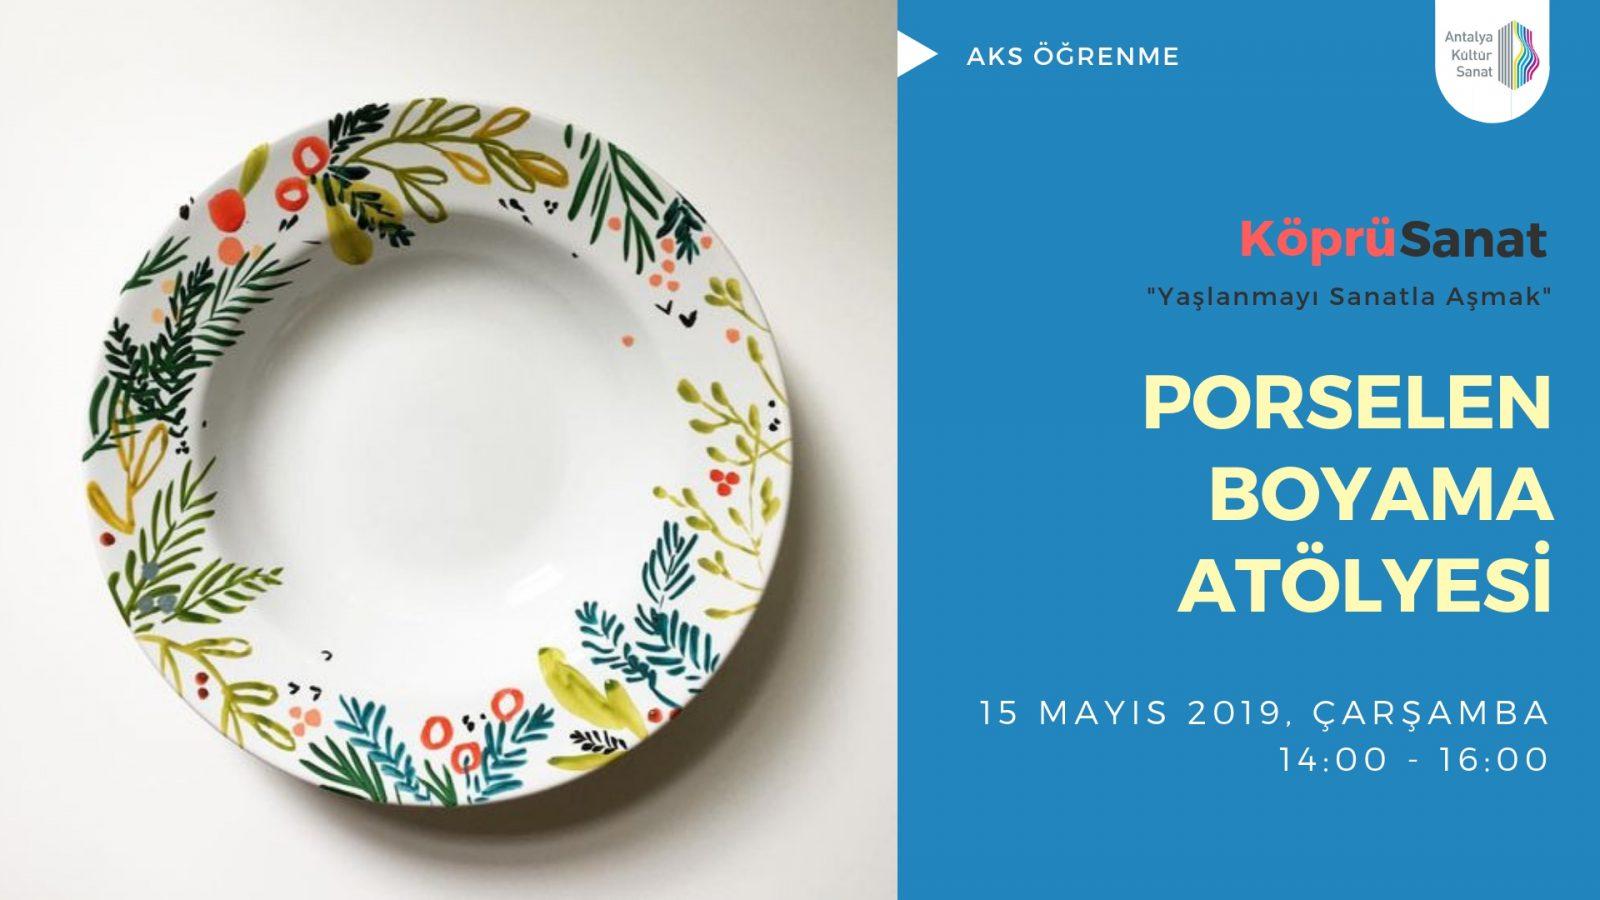 2019 Etkinlikleri Antalya Kultur Sanat